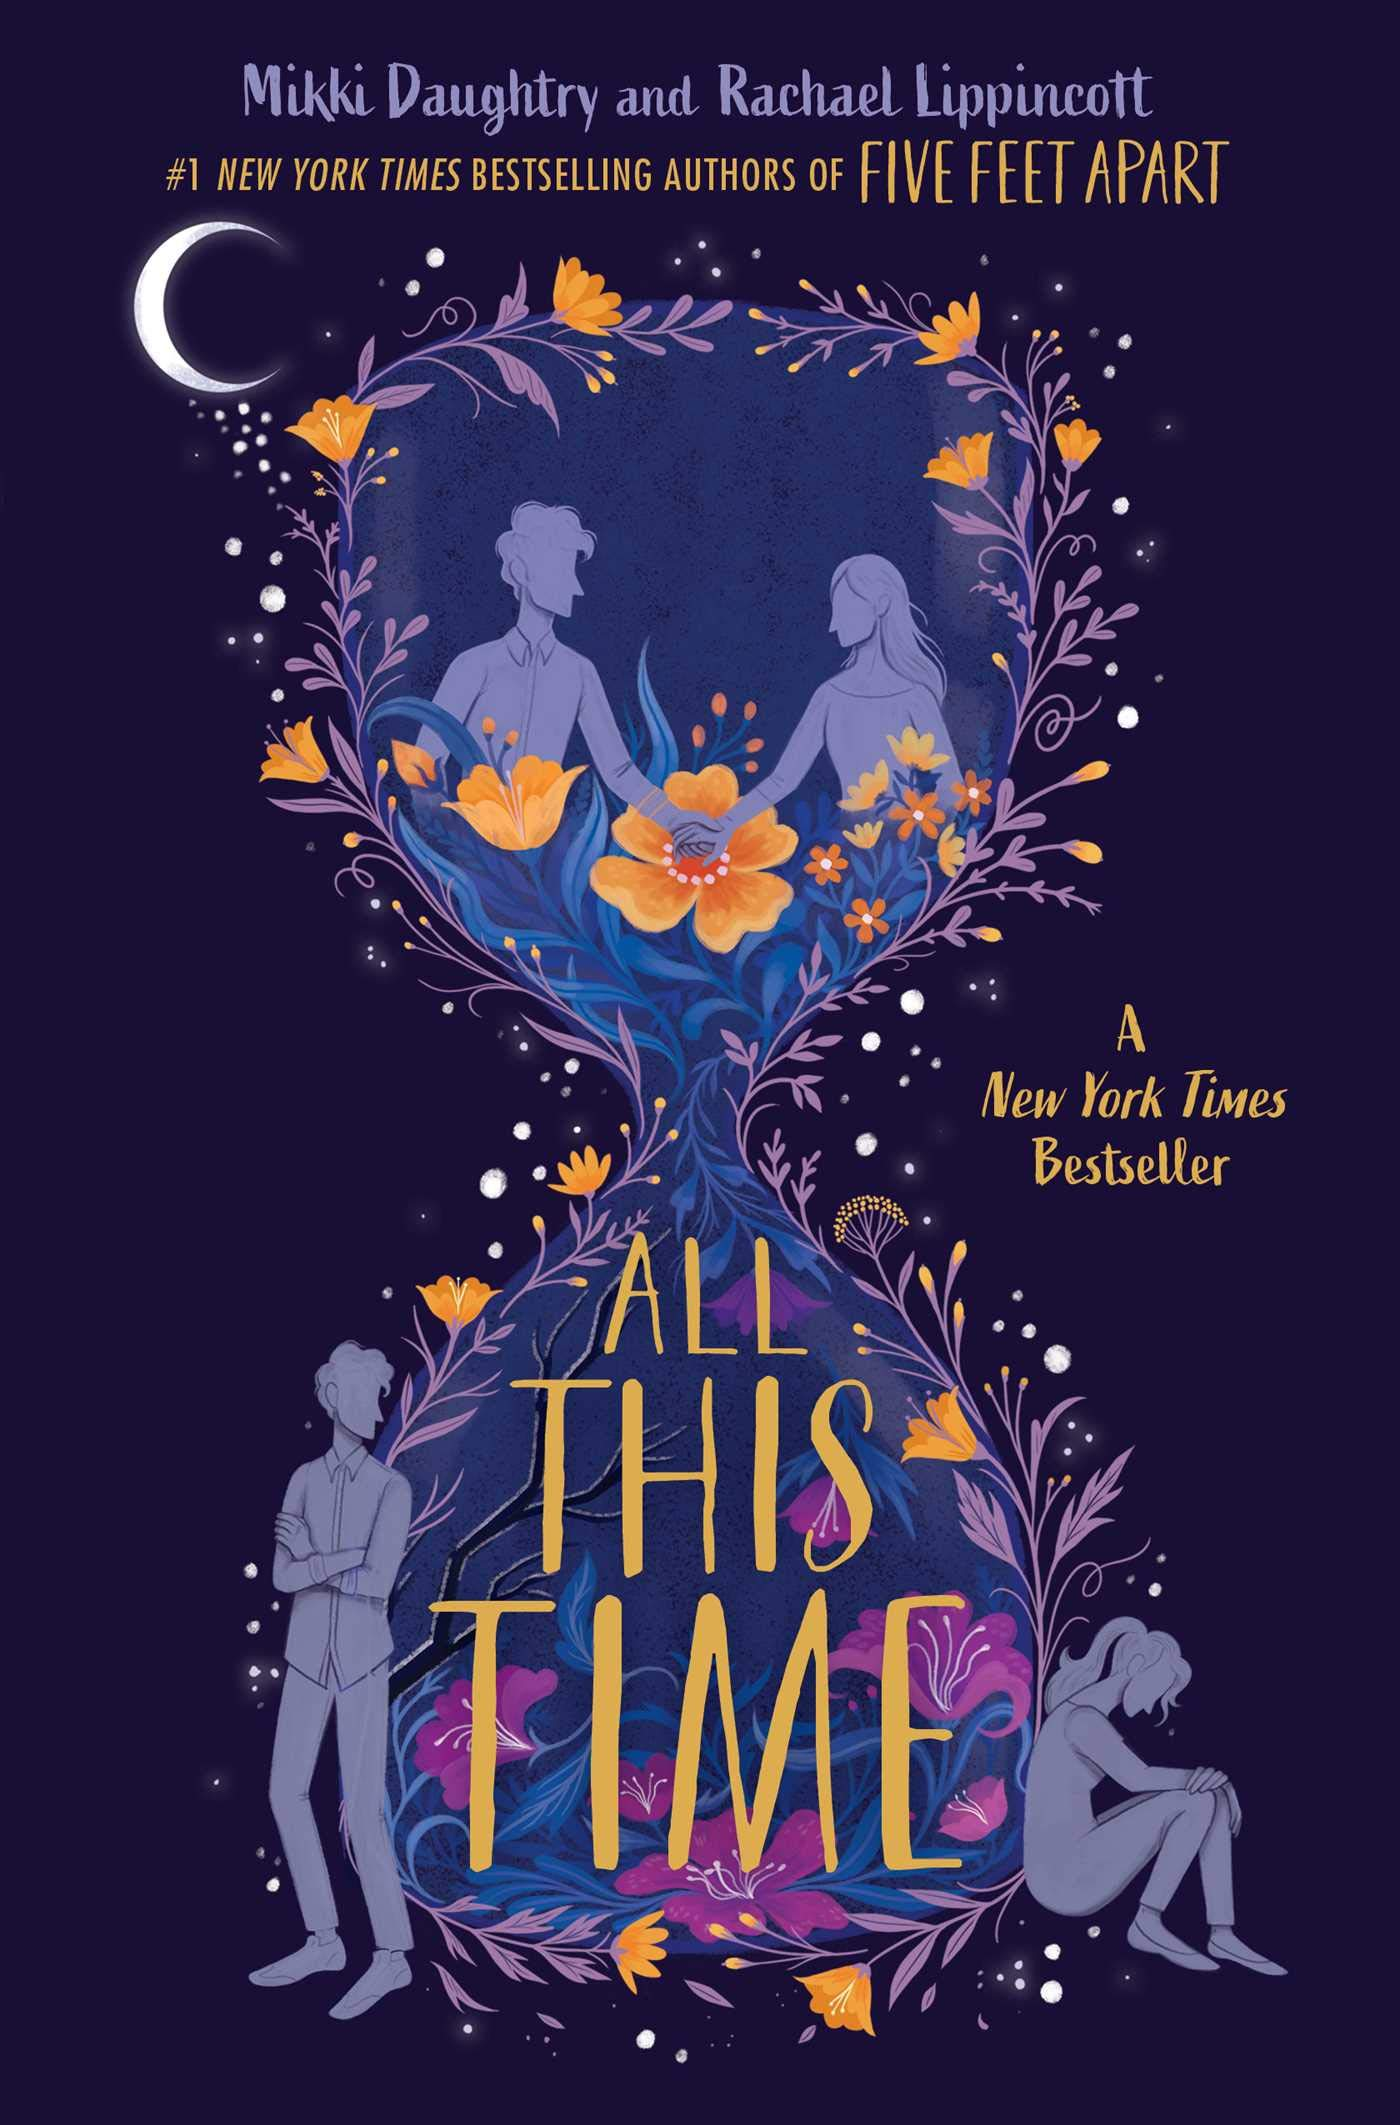 Amazon.com: All This Time (9781534466340): Daughtry, Mikki, Lippincott,  Rachael: Books